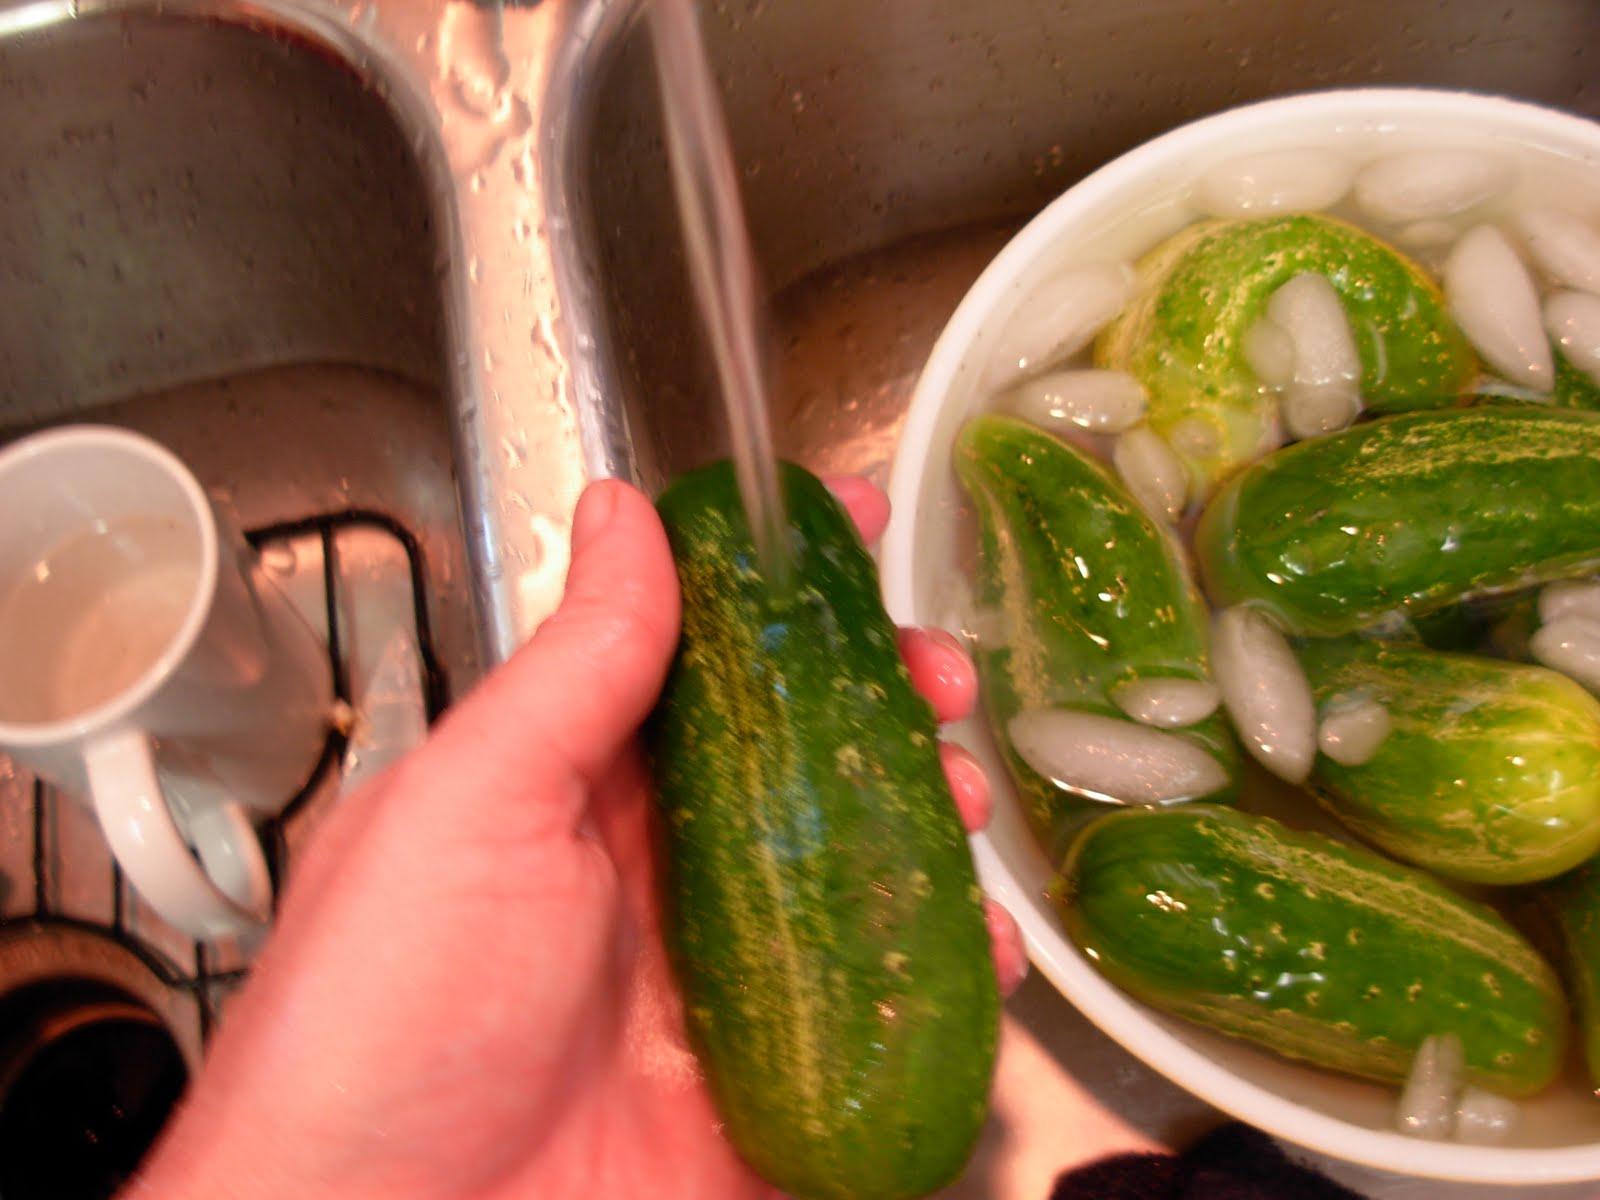 Old Fashioned Grape Leaf Pickles